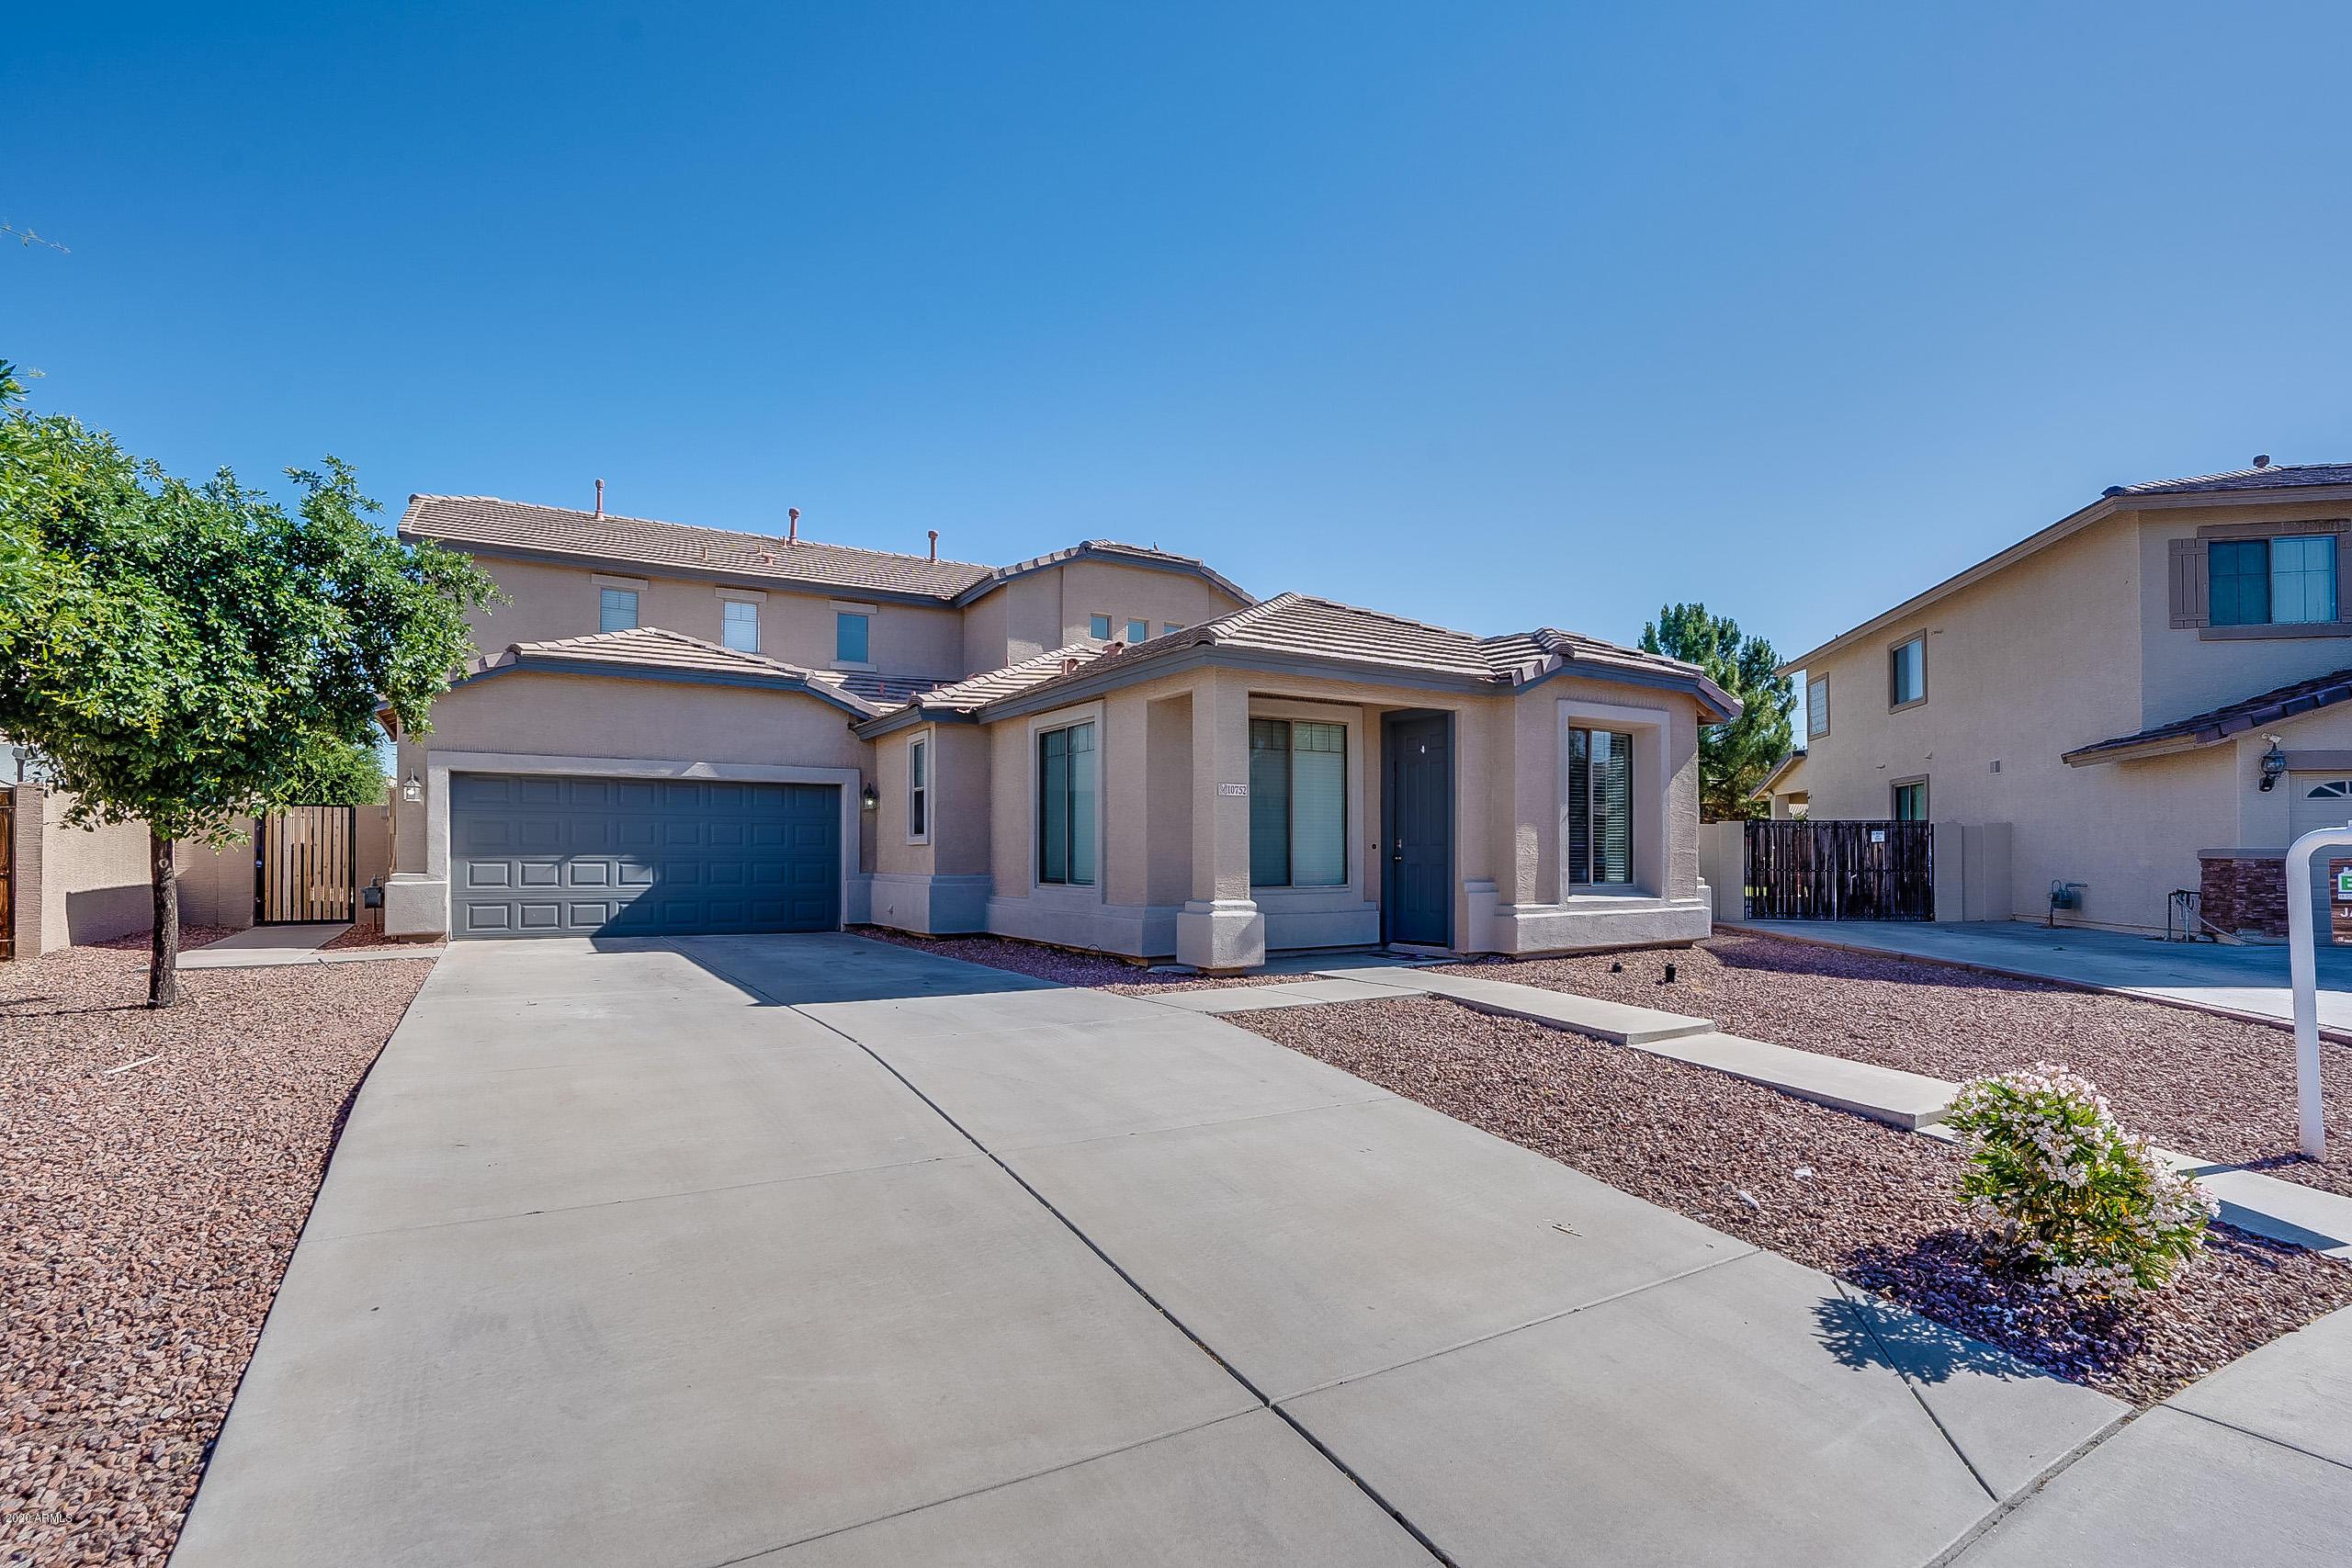 Photo of 10752 W Locust Lane, Avondale, AZ 85323